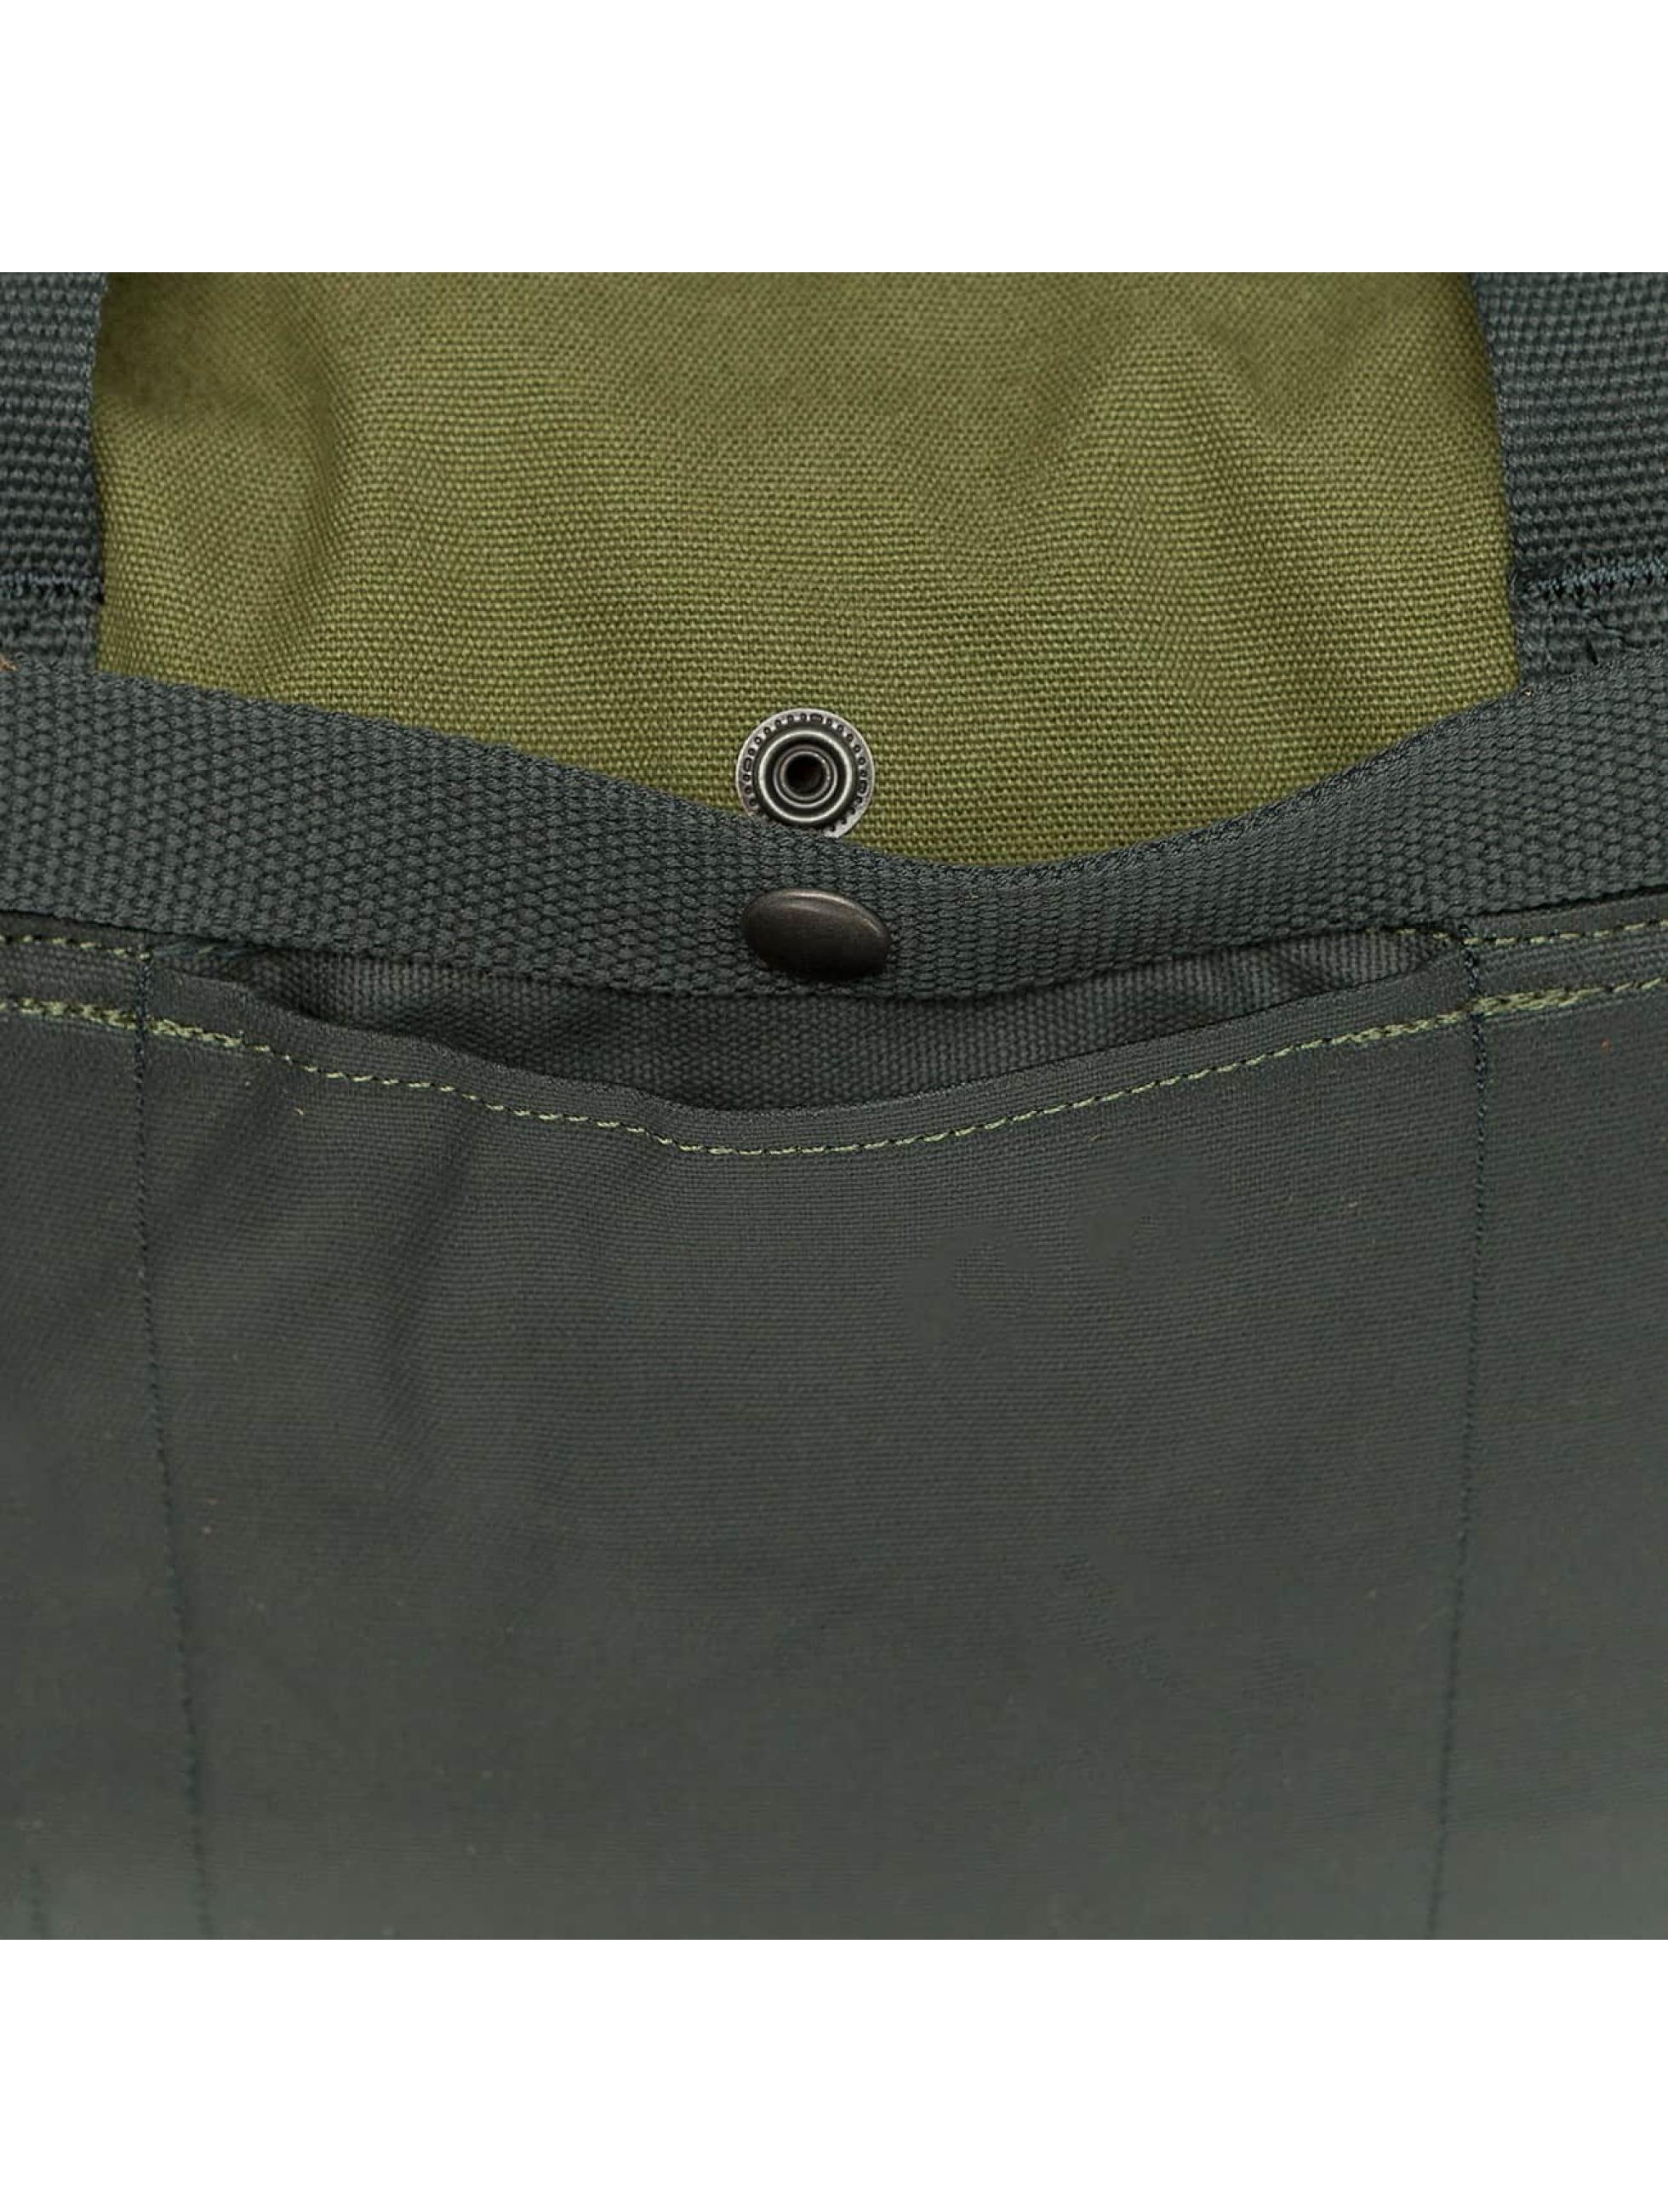 Electric Bag BRIEF black